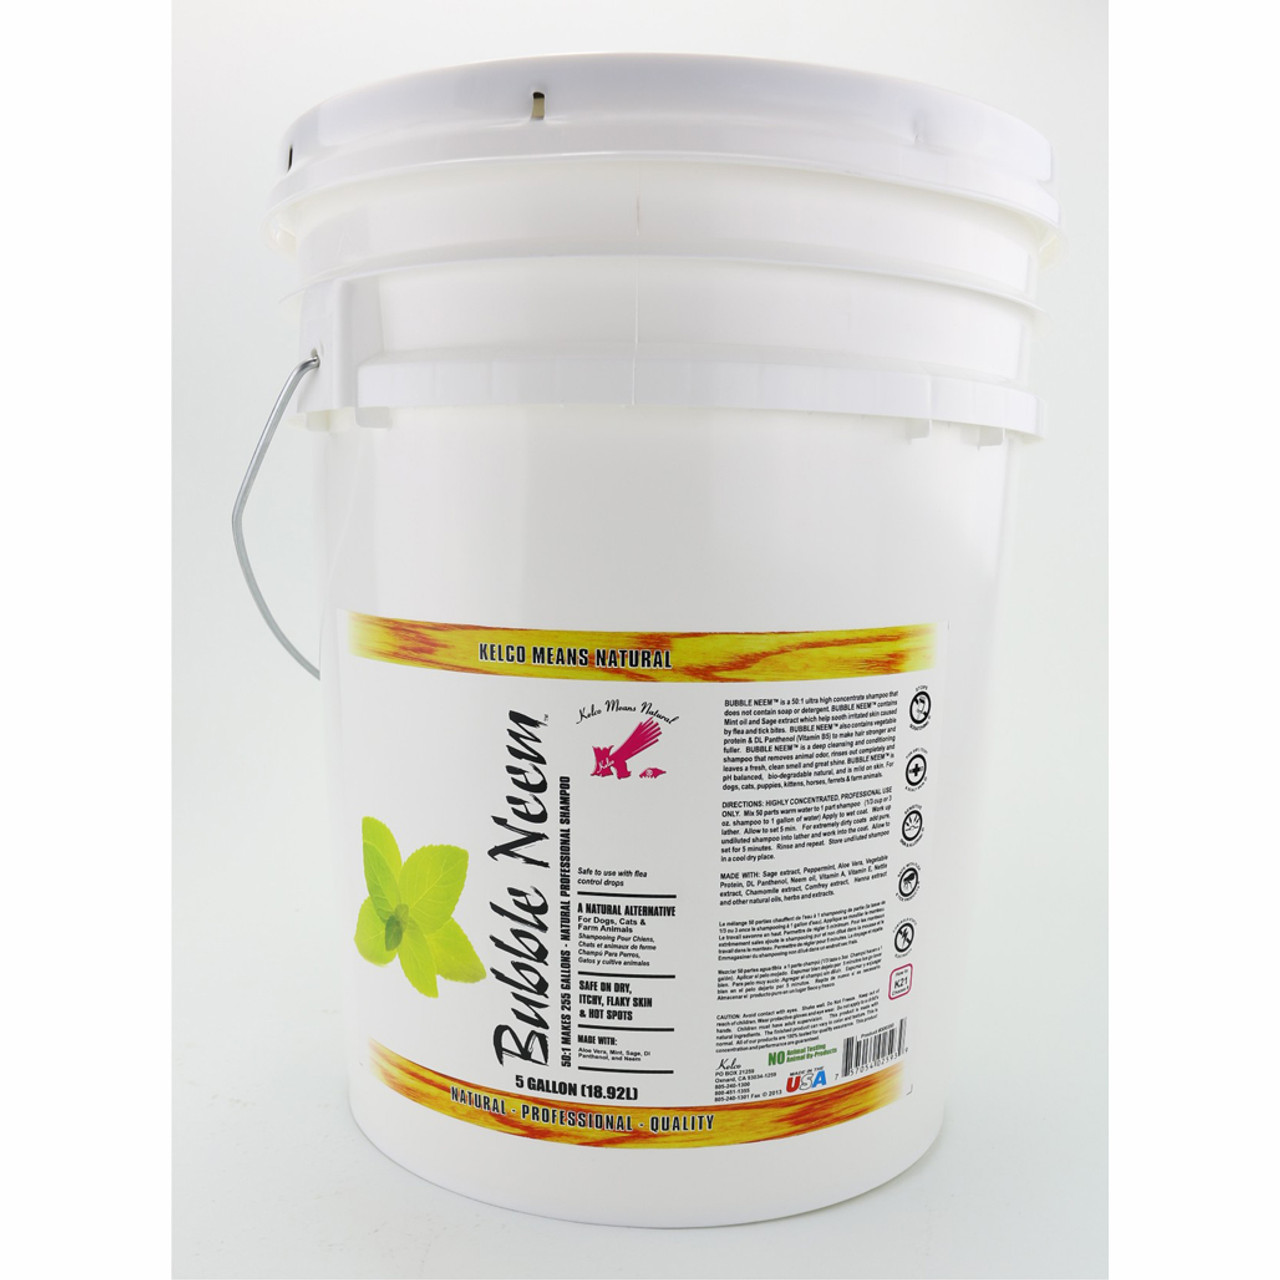 Kelco™ Bubble Neem Shampoo in 5 Gallon Size